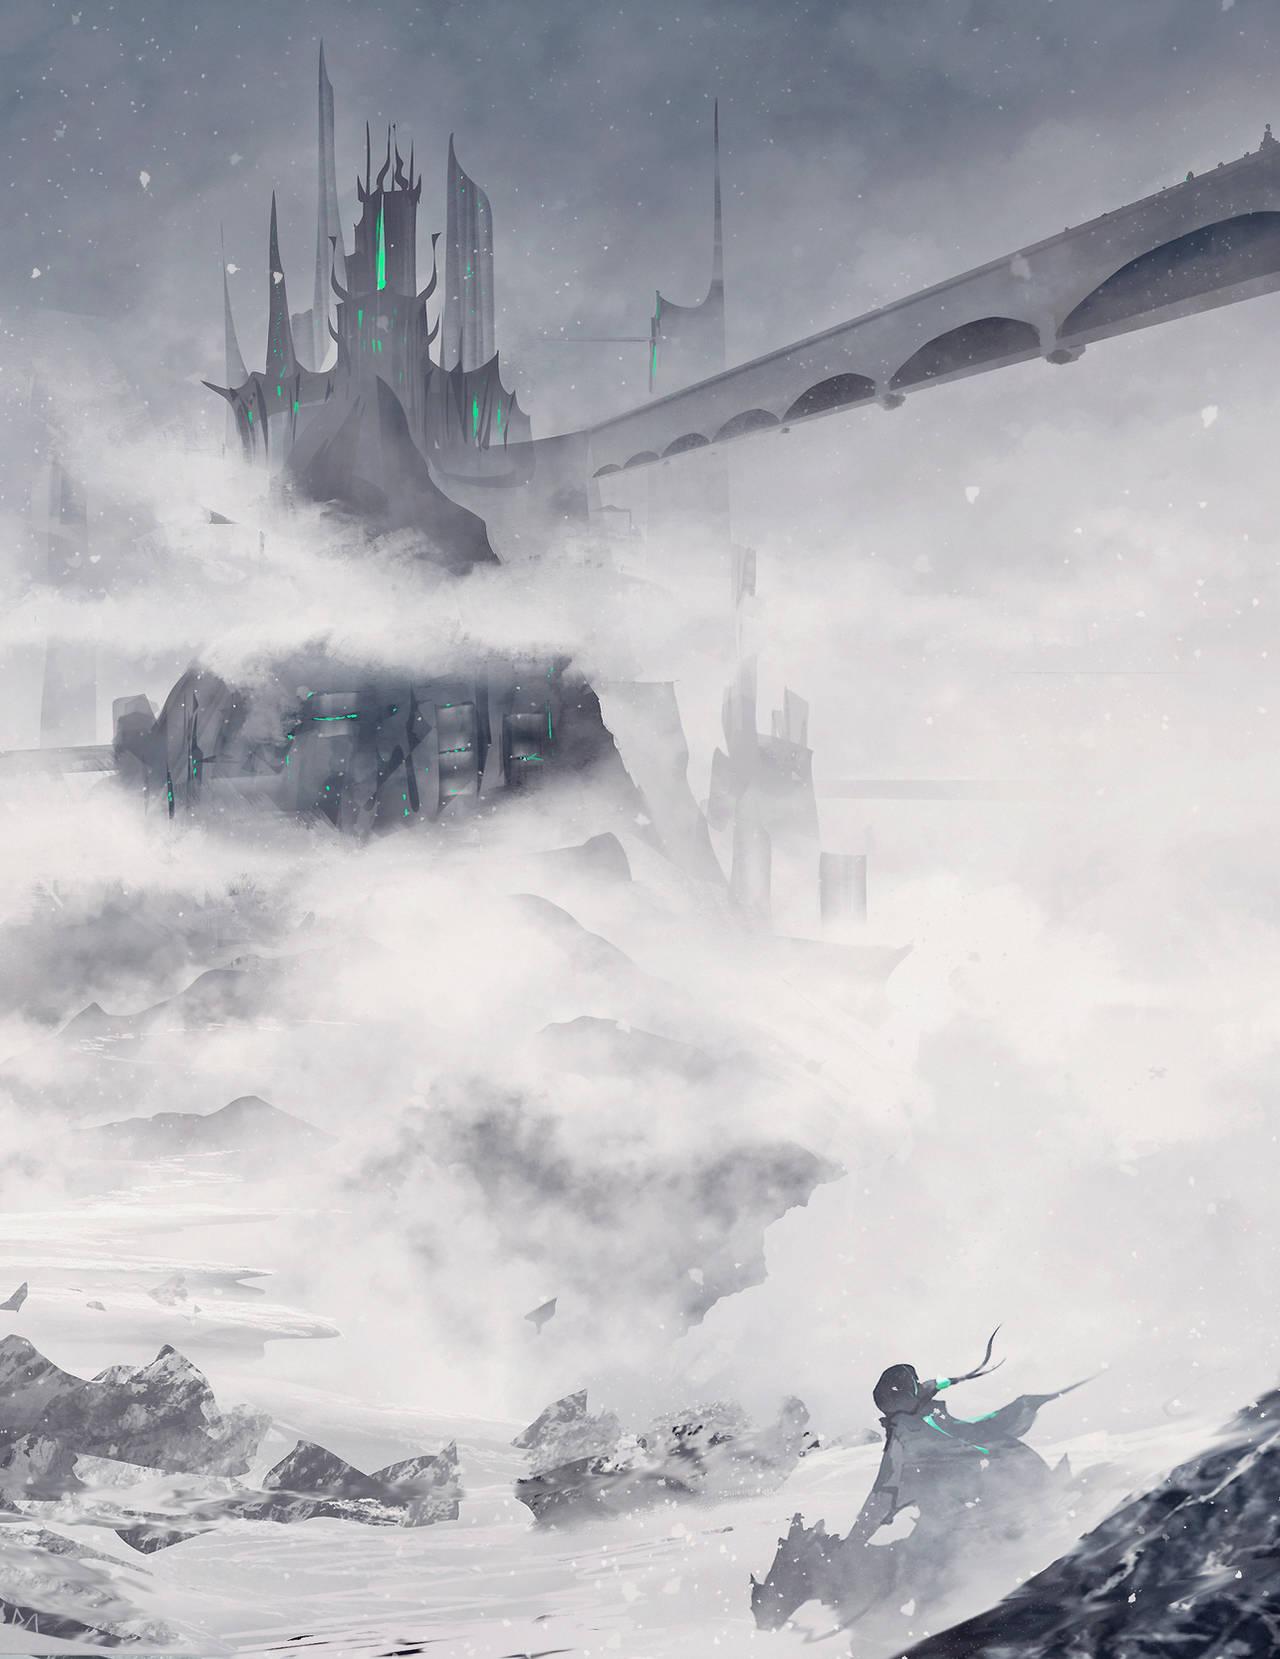 Cloud city by DaisanART